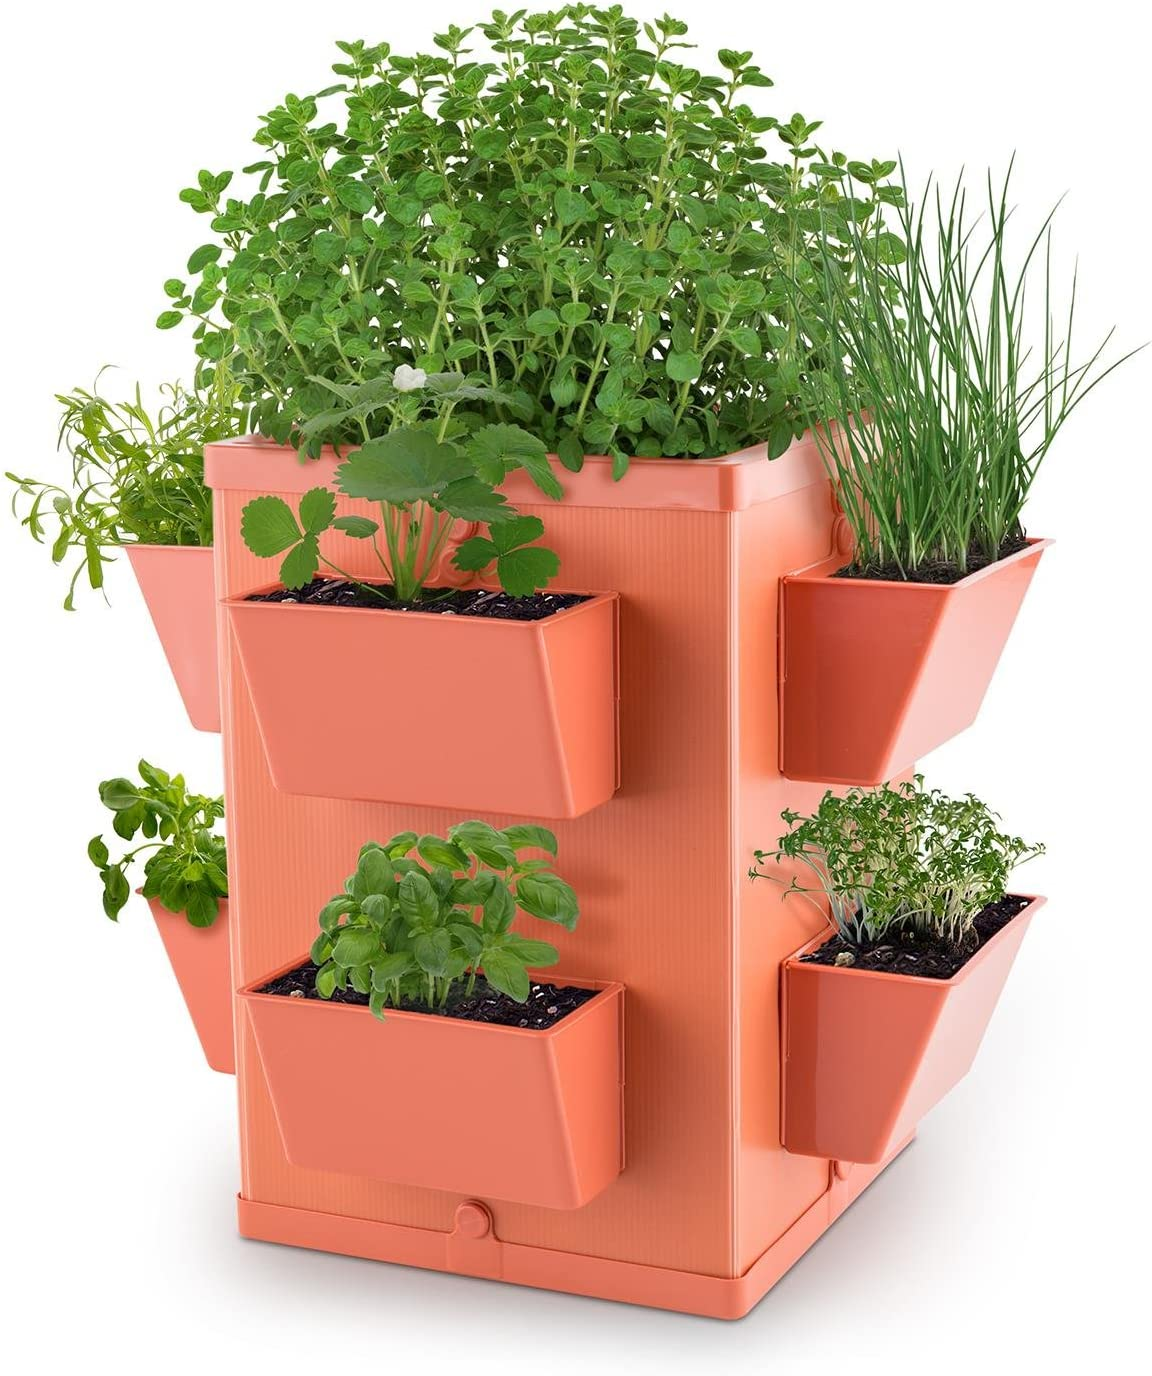 Waldbeck Herbie Hero Herp Pot Plant Pot 8 Plant Trays PP Terracotta